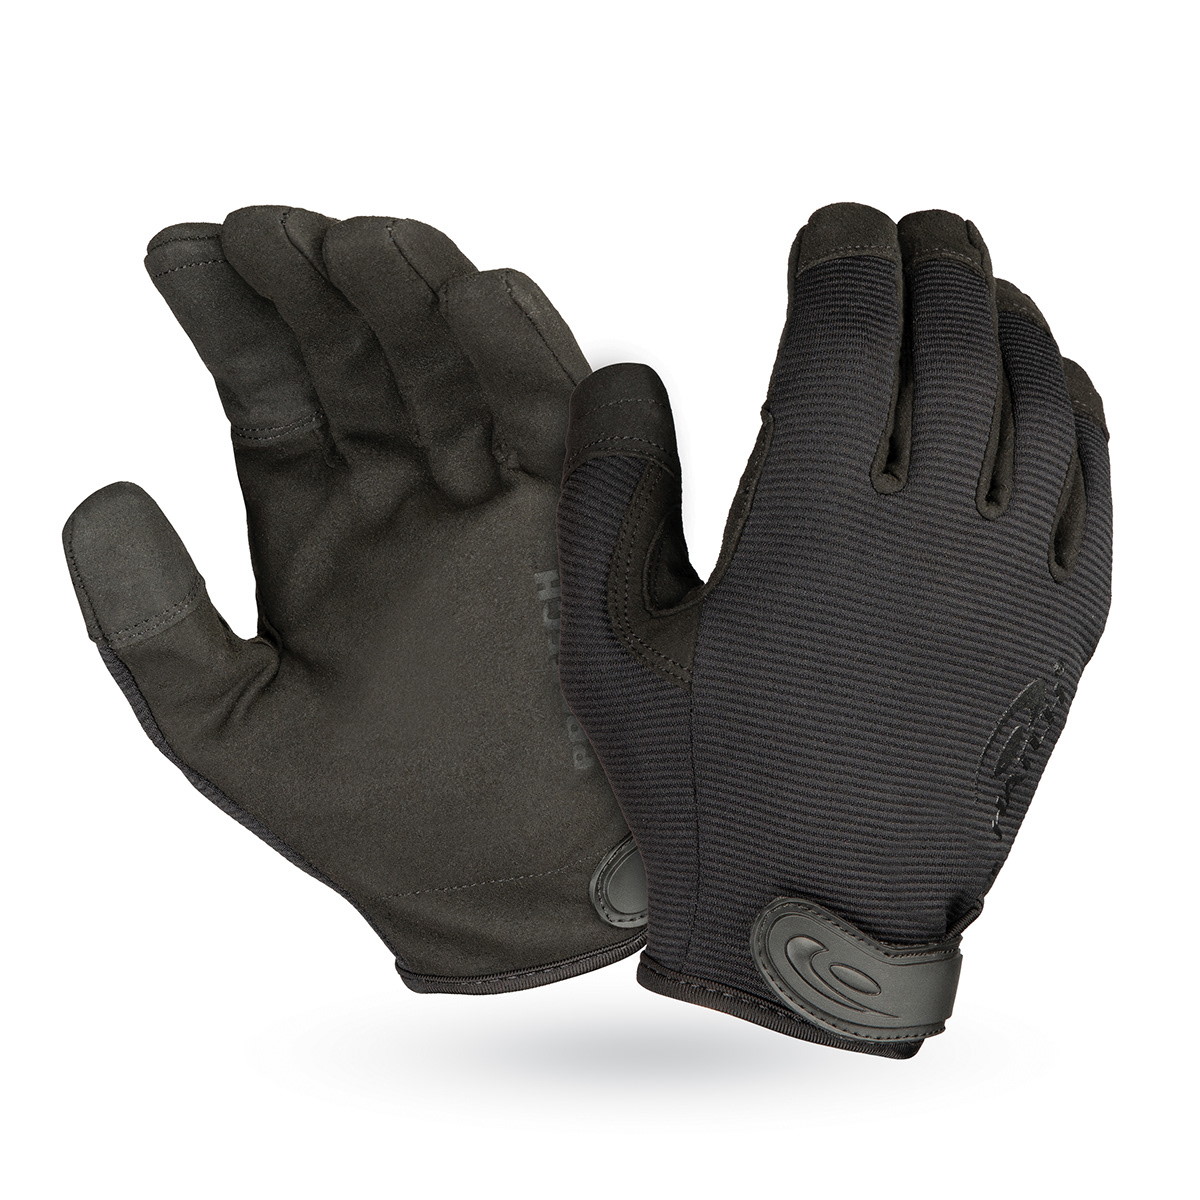 Glove design industrial gloves Product Management workplace saftey